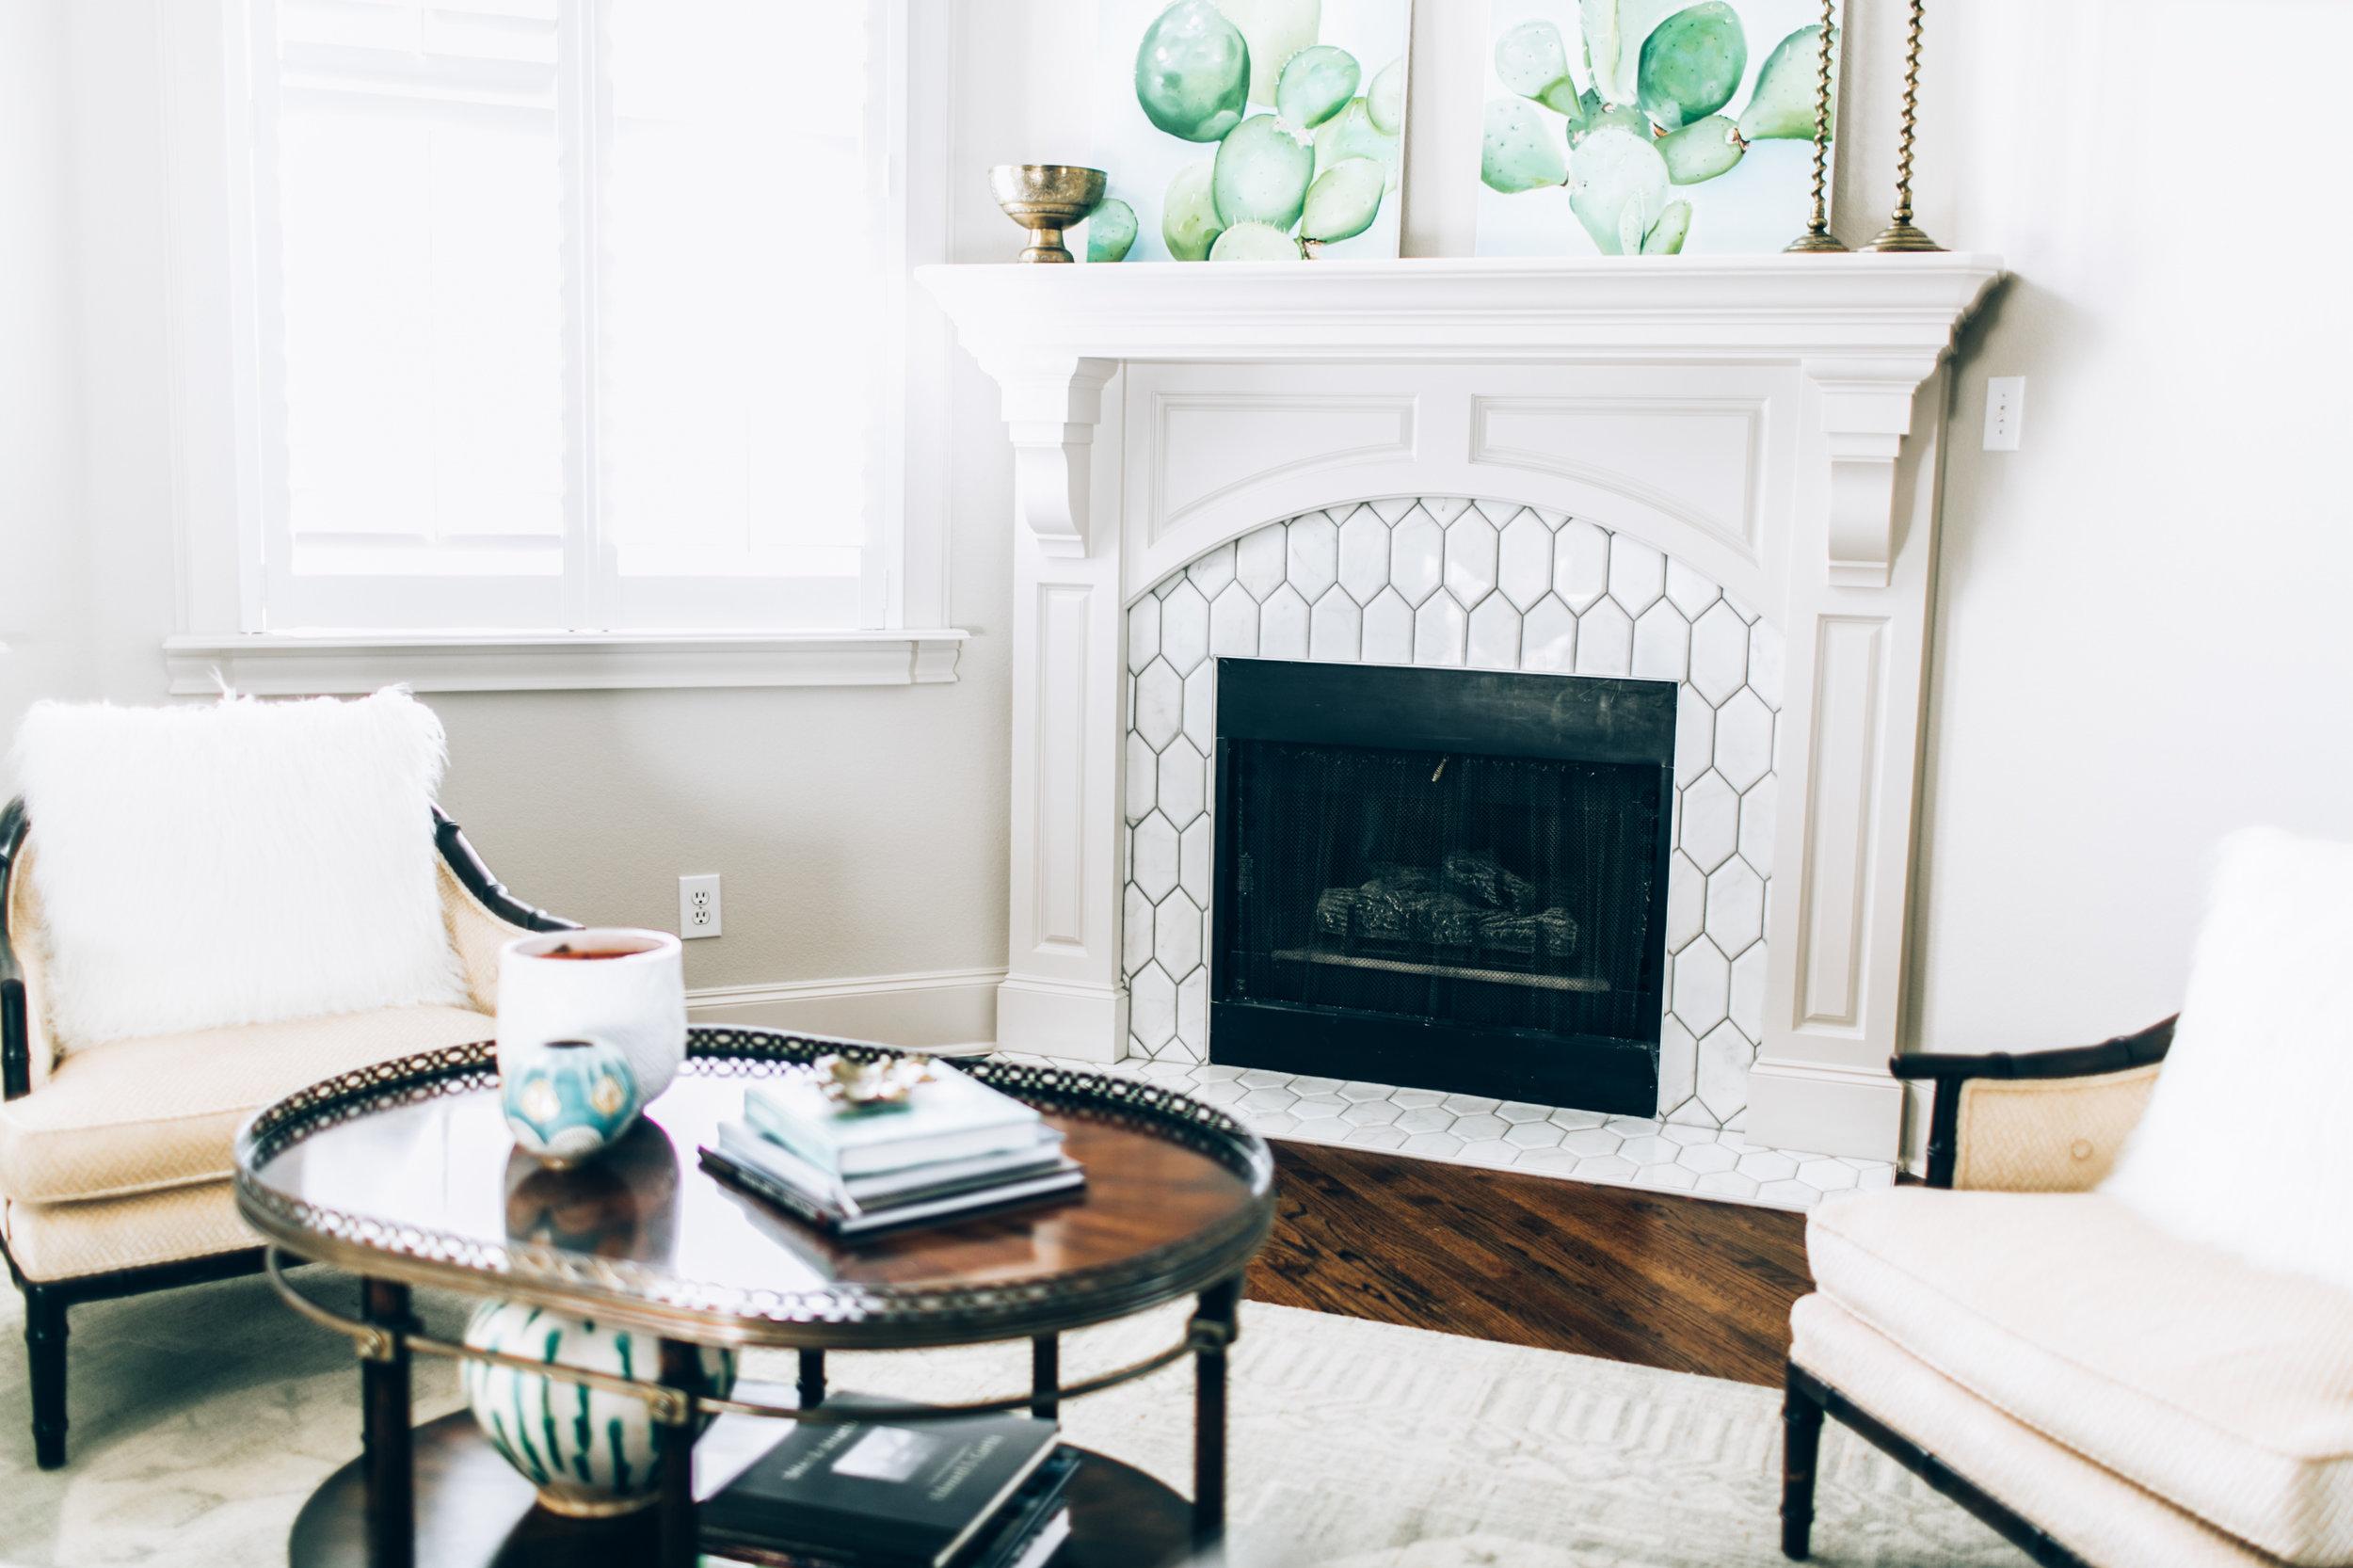 Home Remodel Southlake Texas-85.jpg